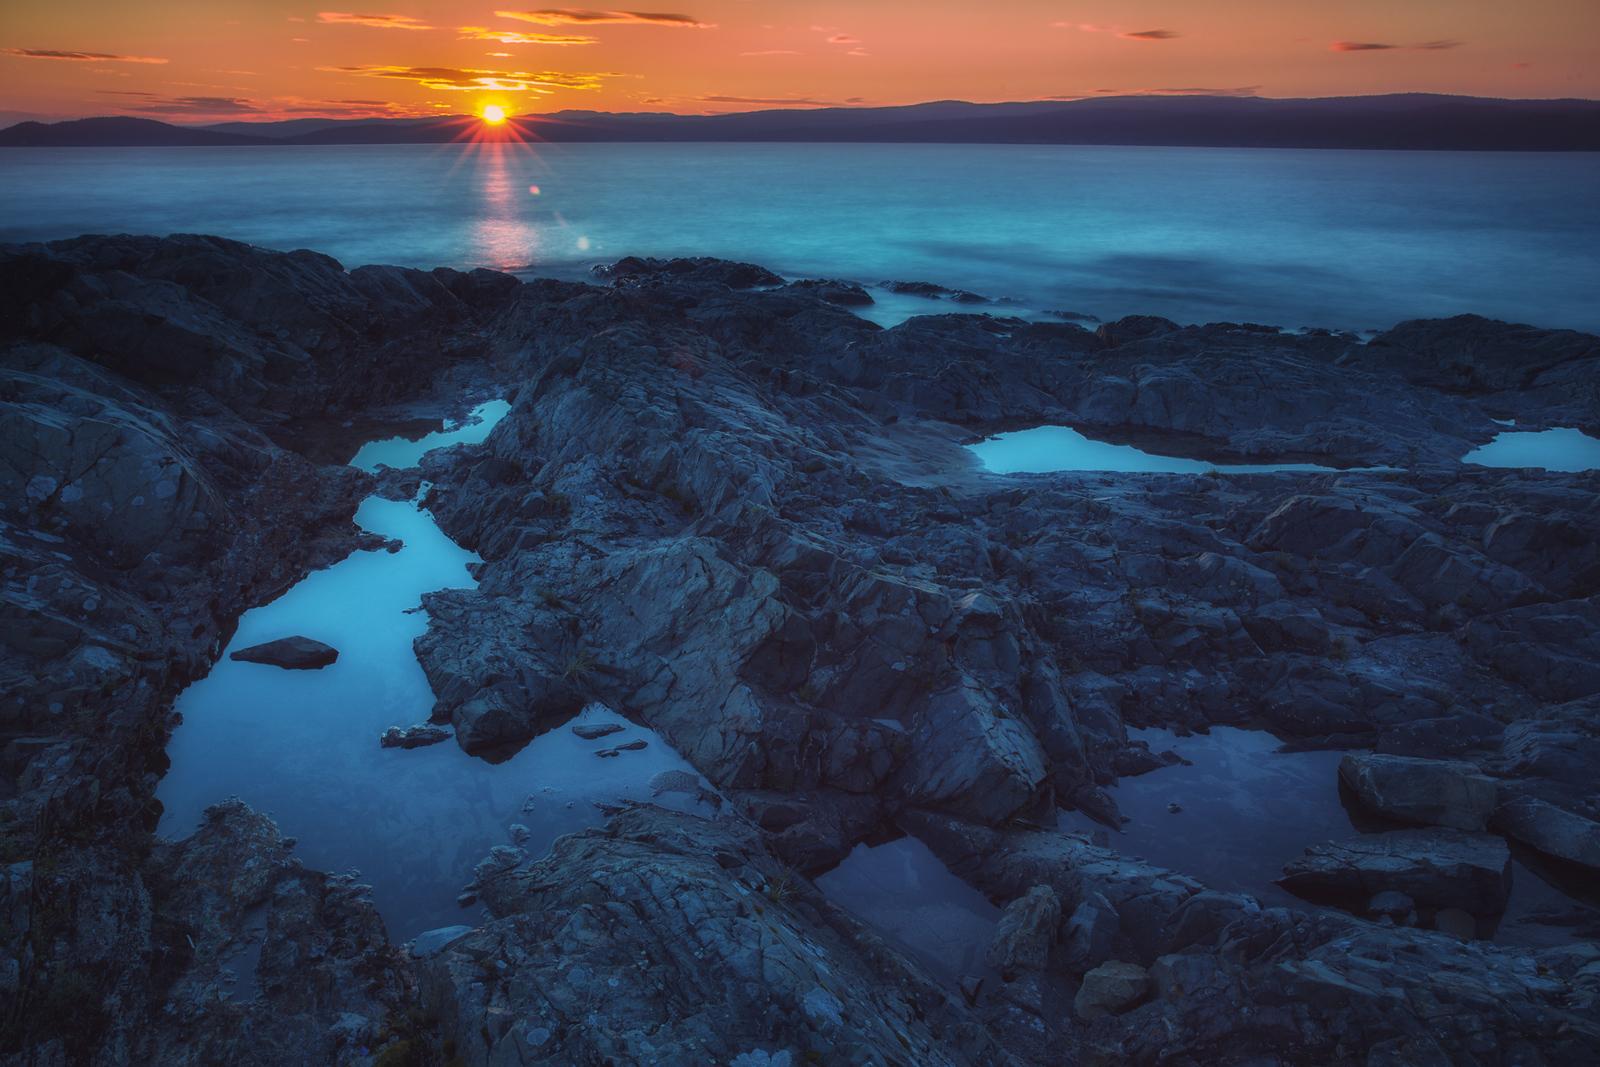 The sun sets at Rock Island Lodge on Lake Superior